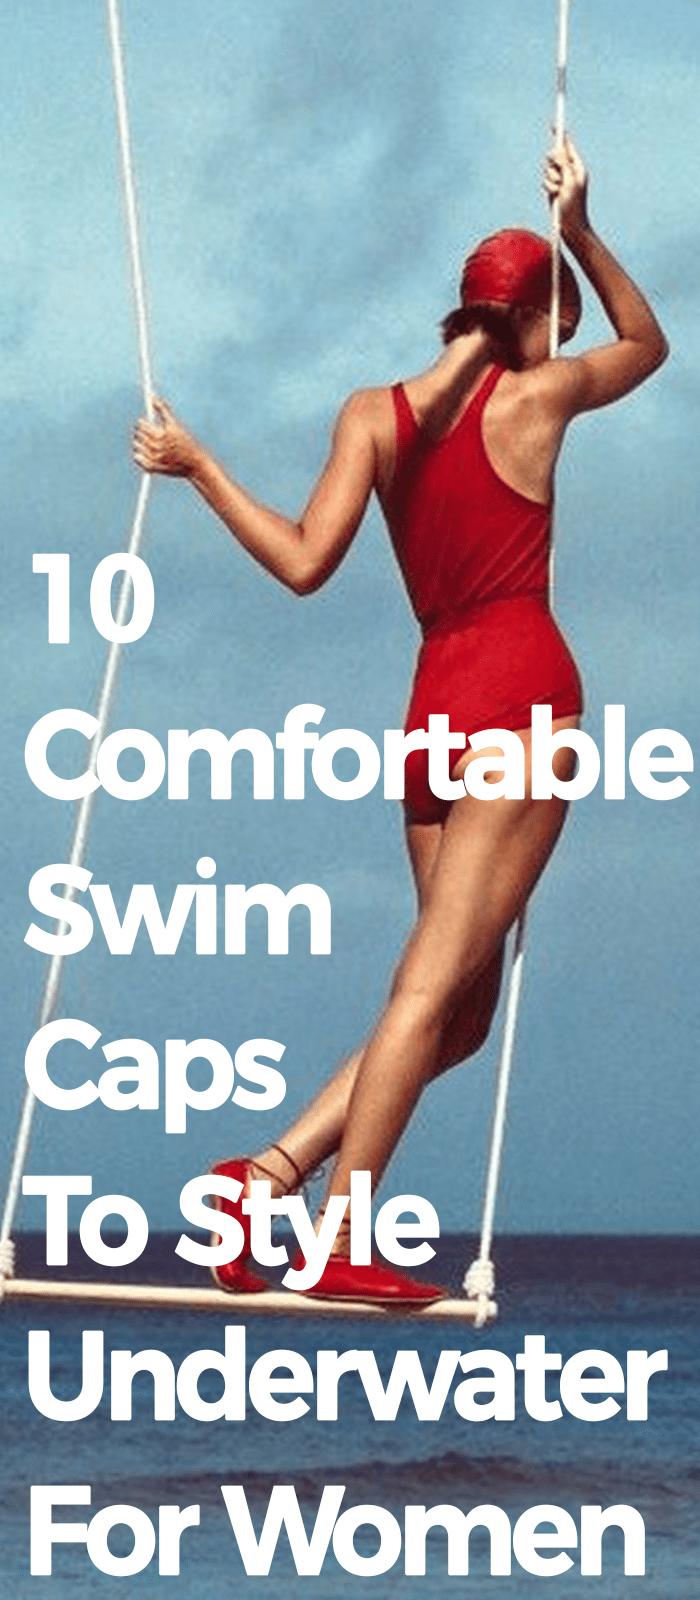 10 Comfortable swim caps to style underwater for women